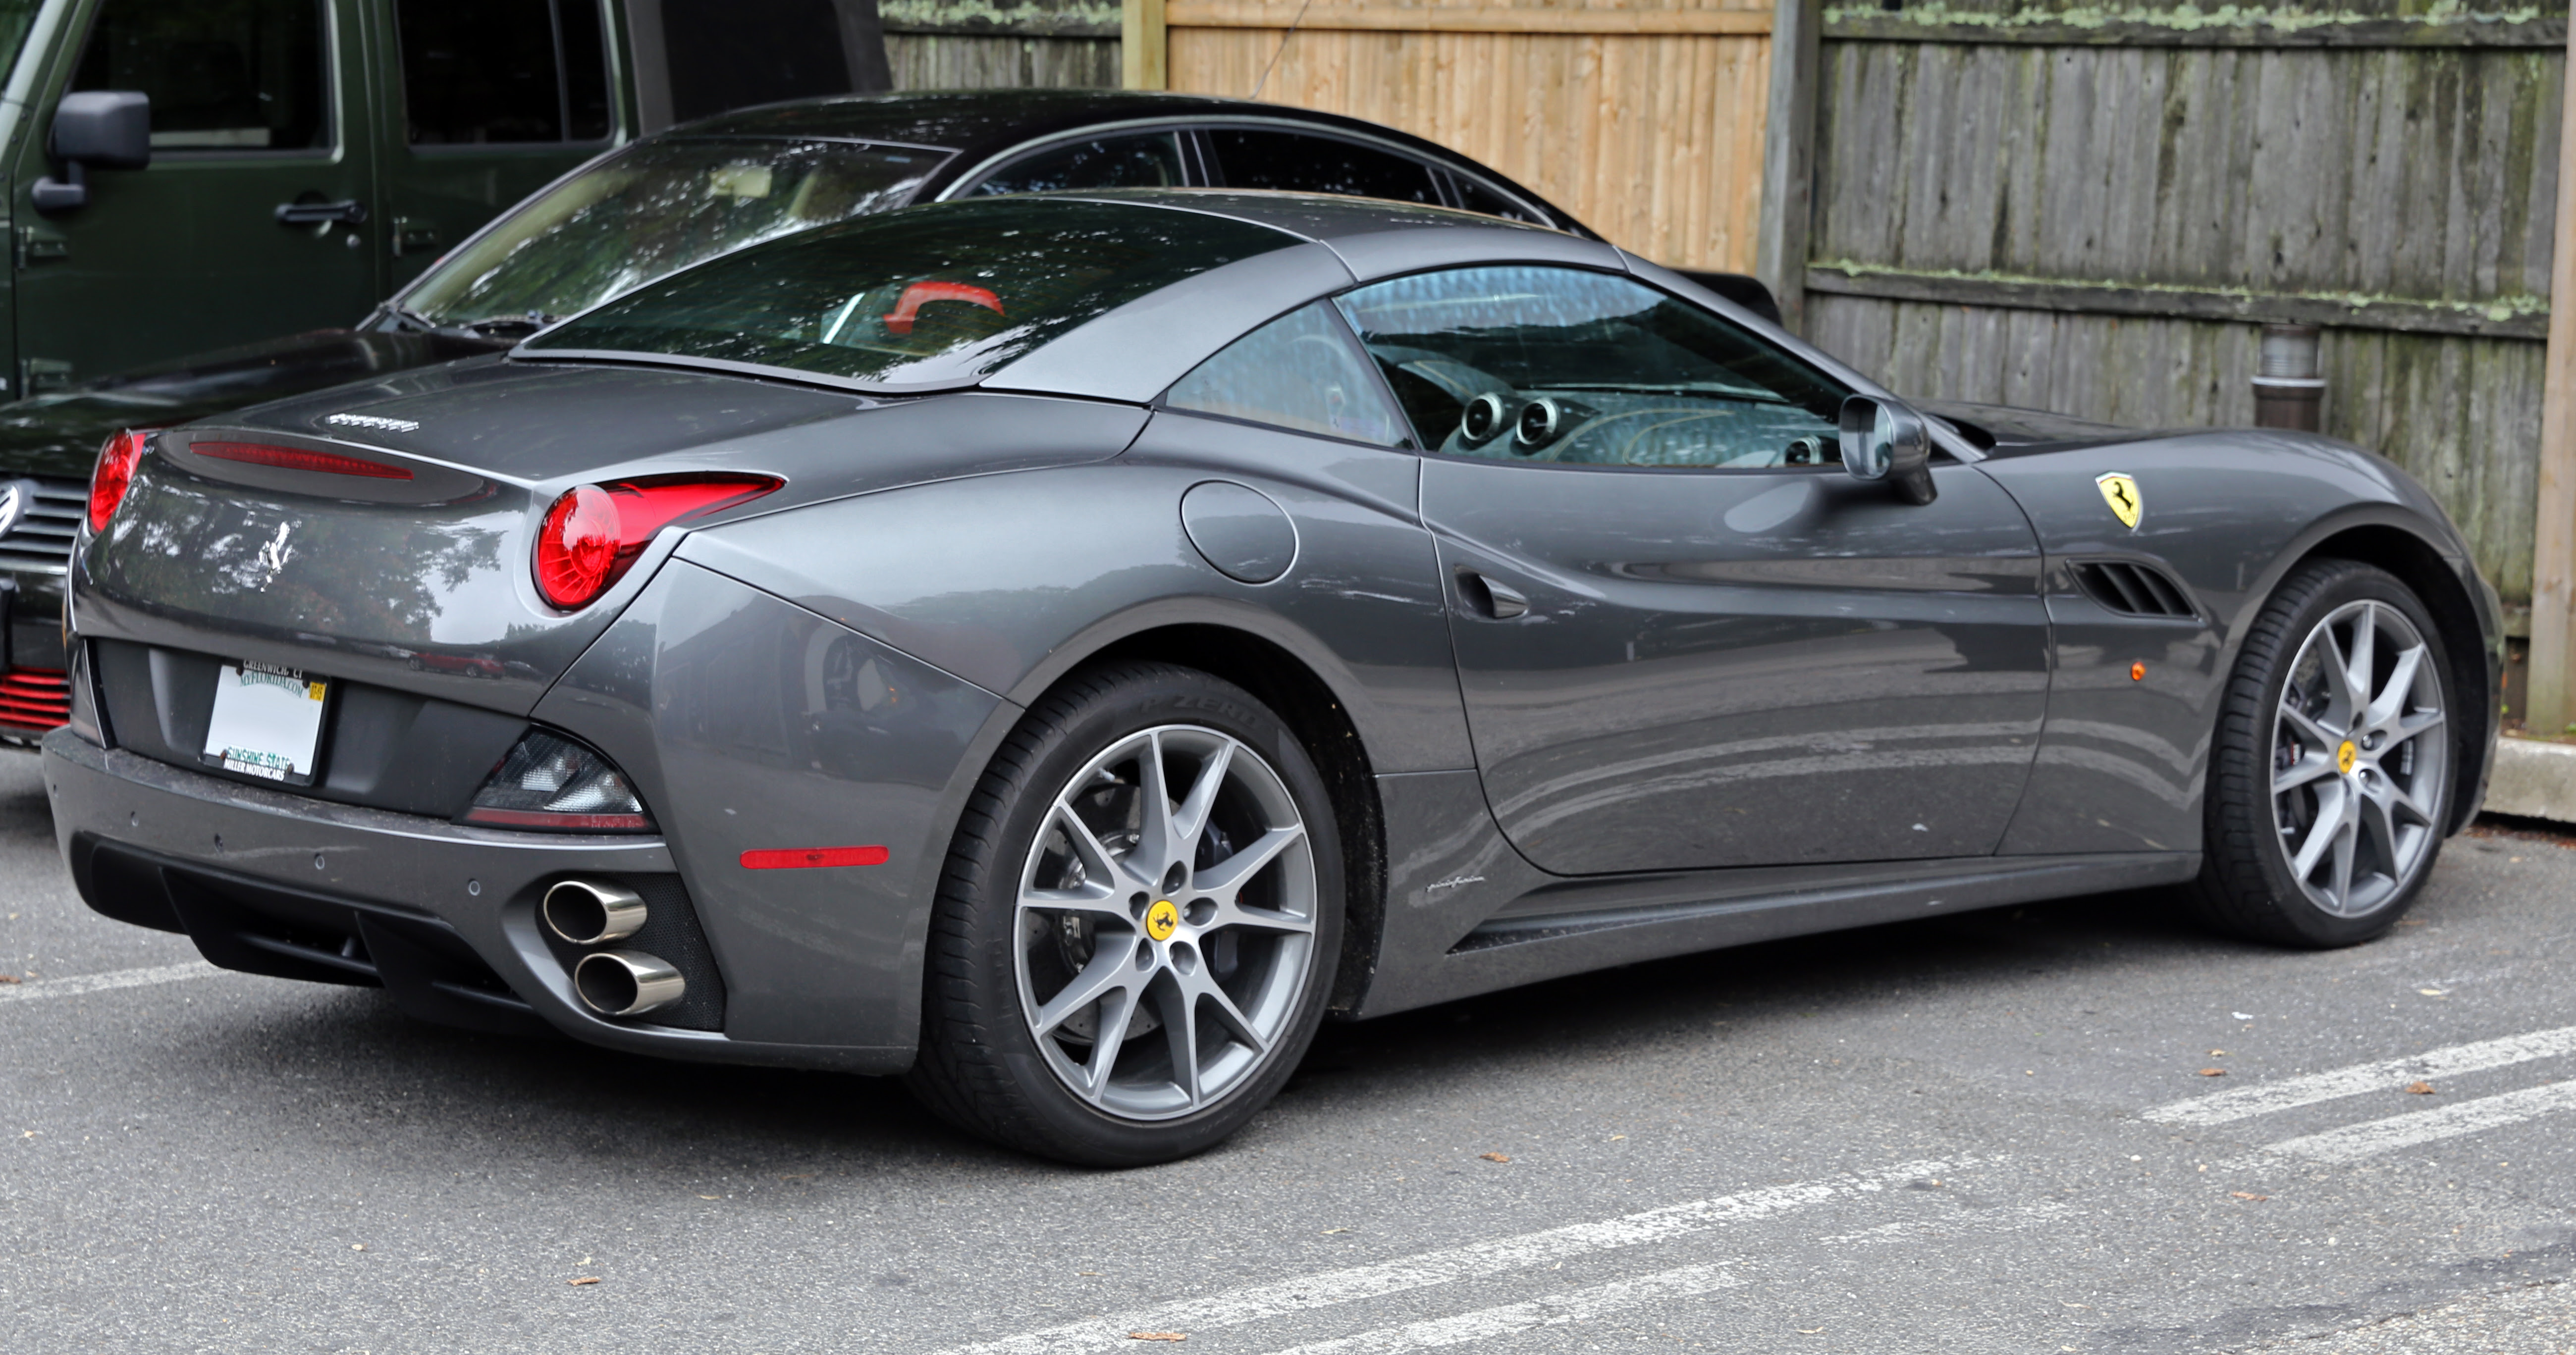 File:2014 Ferrari California (grey), rear right.jpg